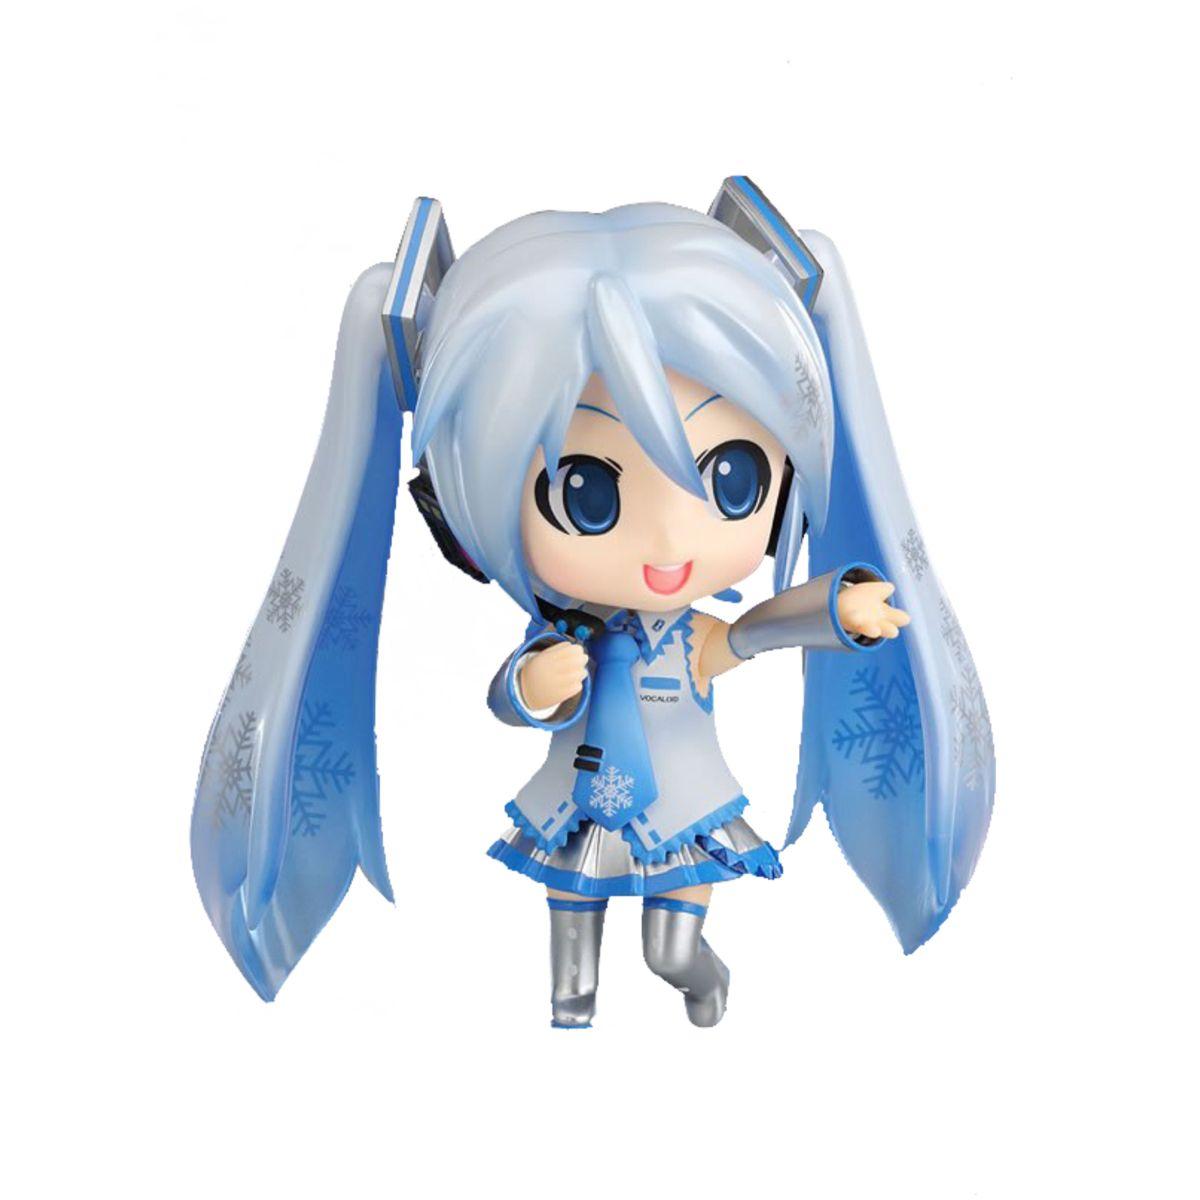 Snow Hatsune Miku Nendoroid Png Nendoroid Anime Figures Miku